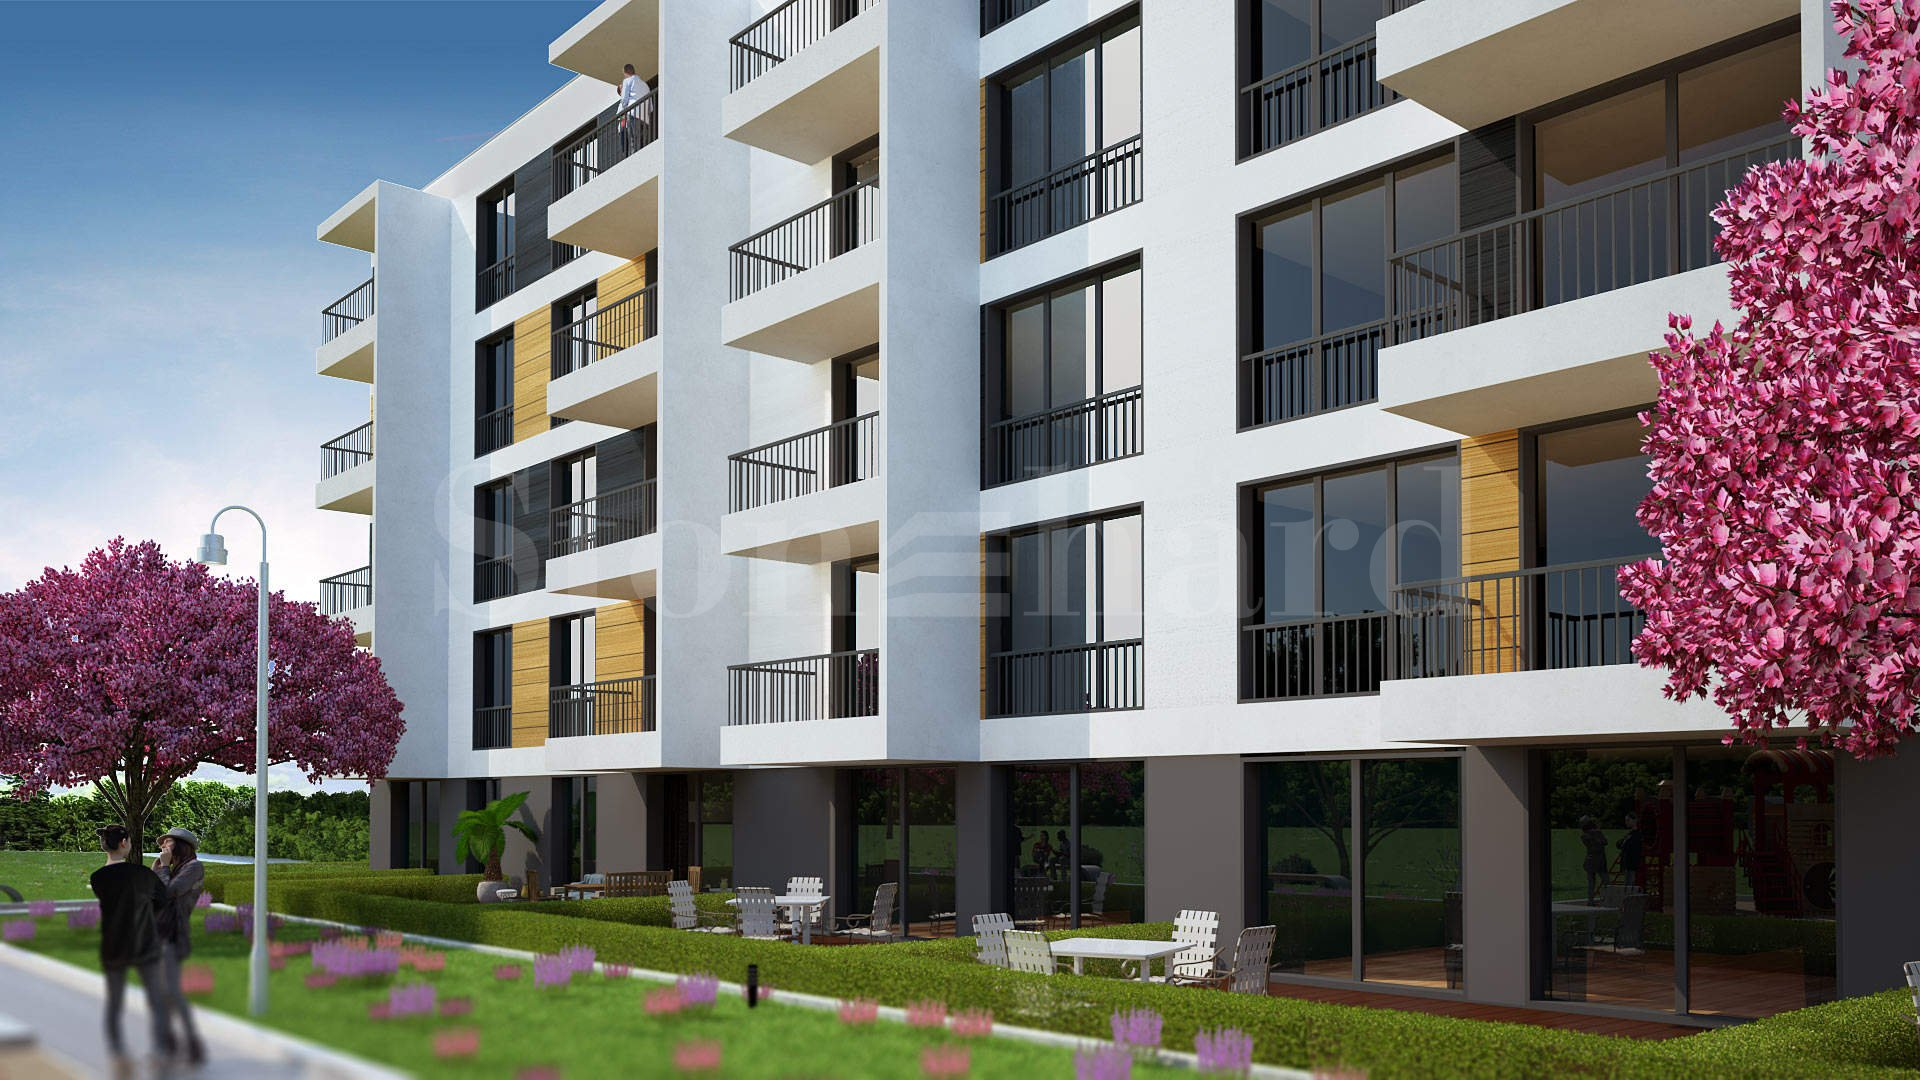 Жилищна сграда с луксозни апартаменти и подземен гараж1 - Stonehard